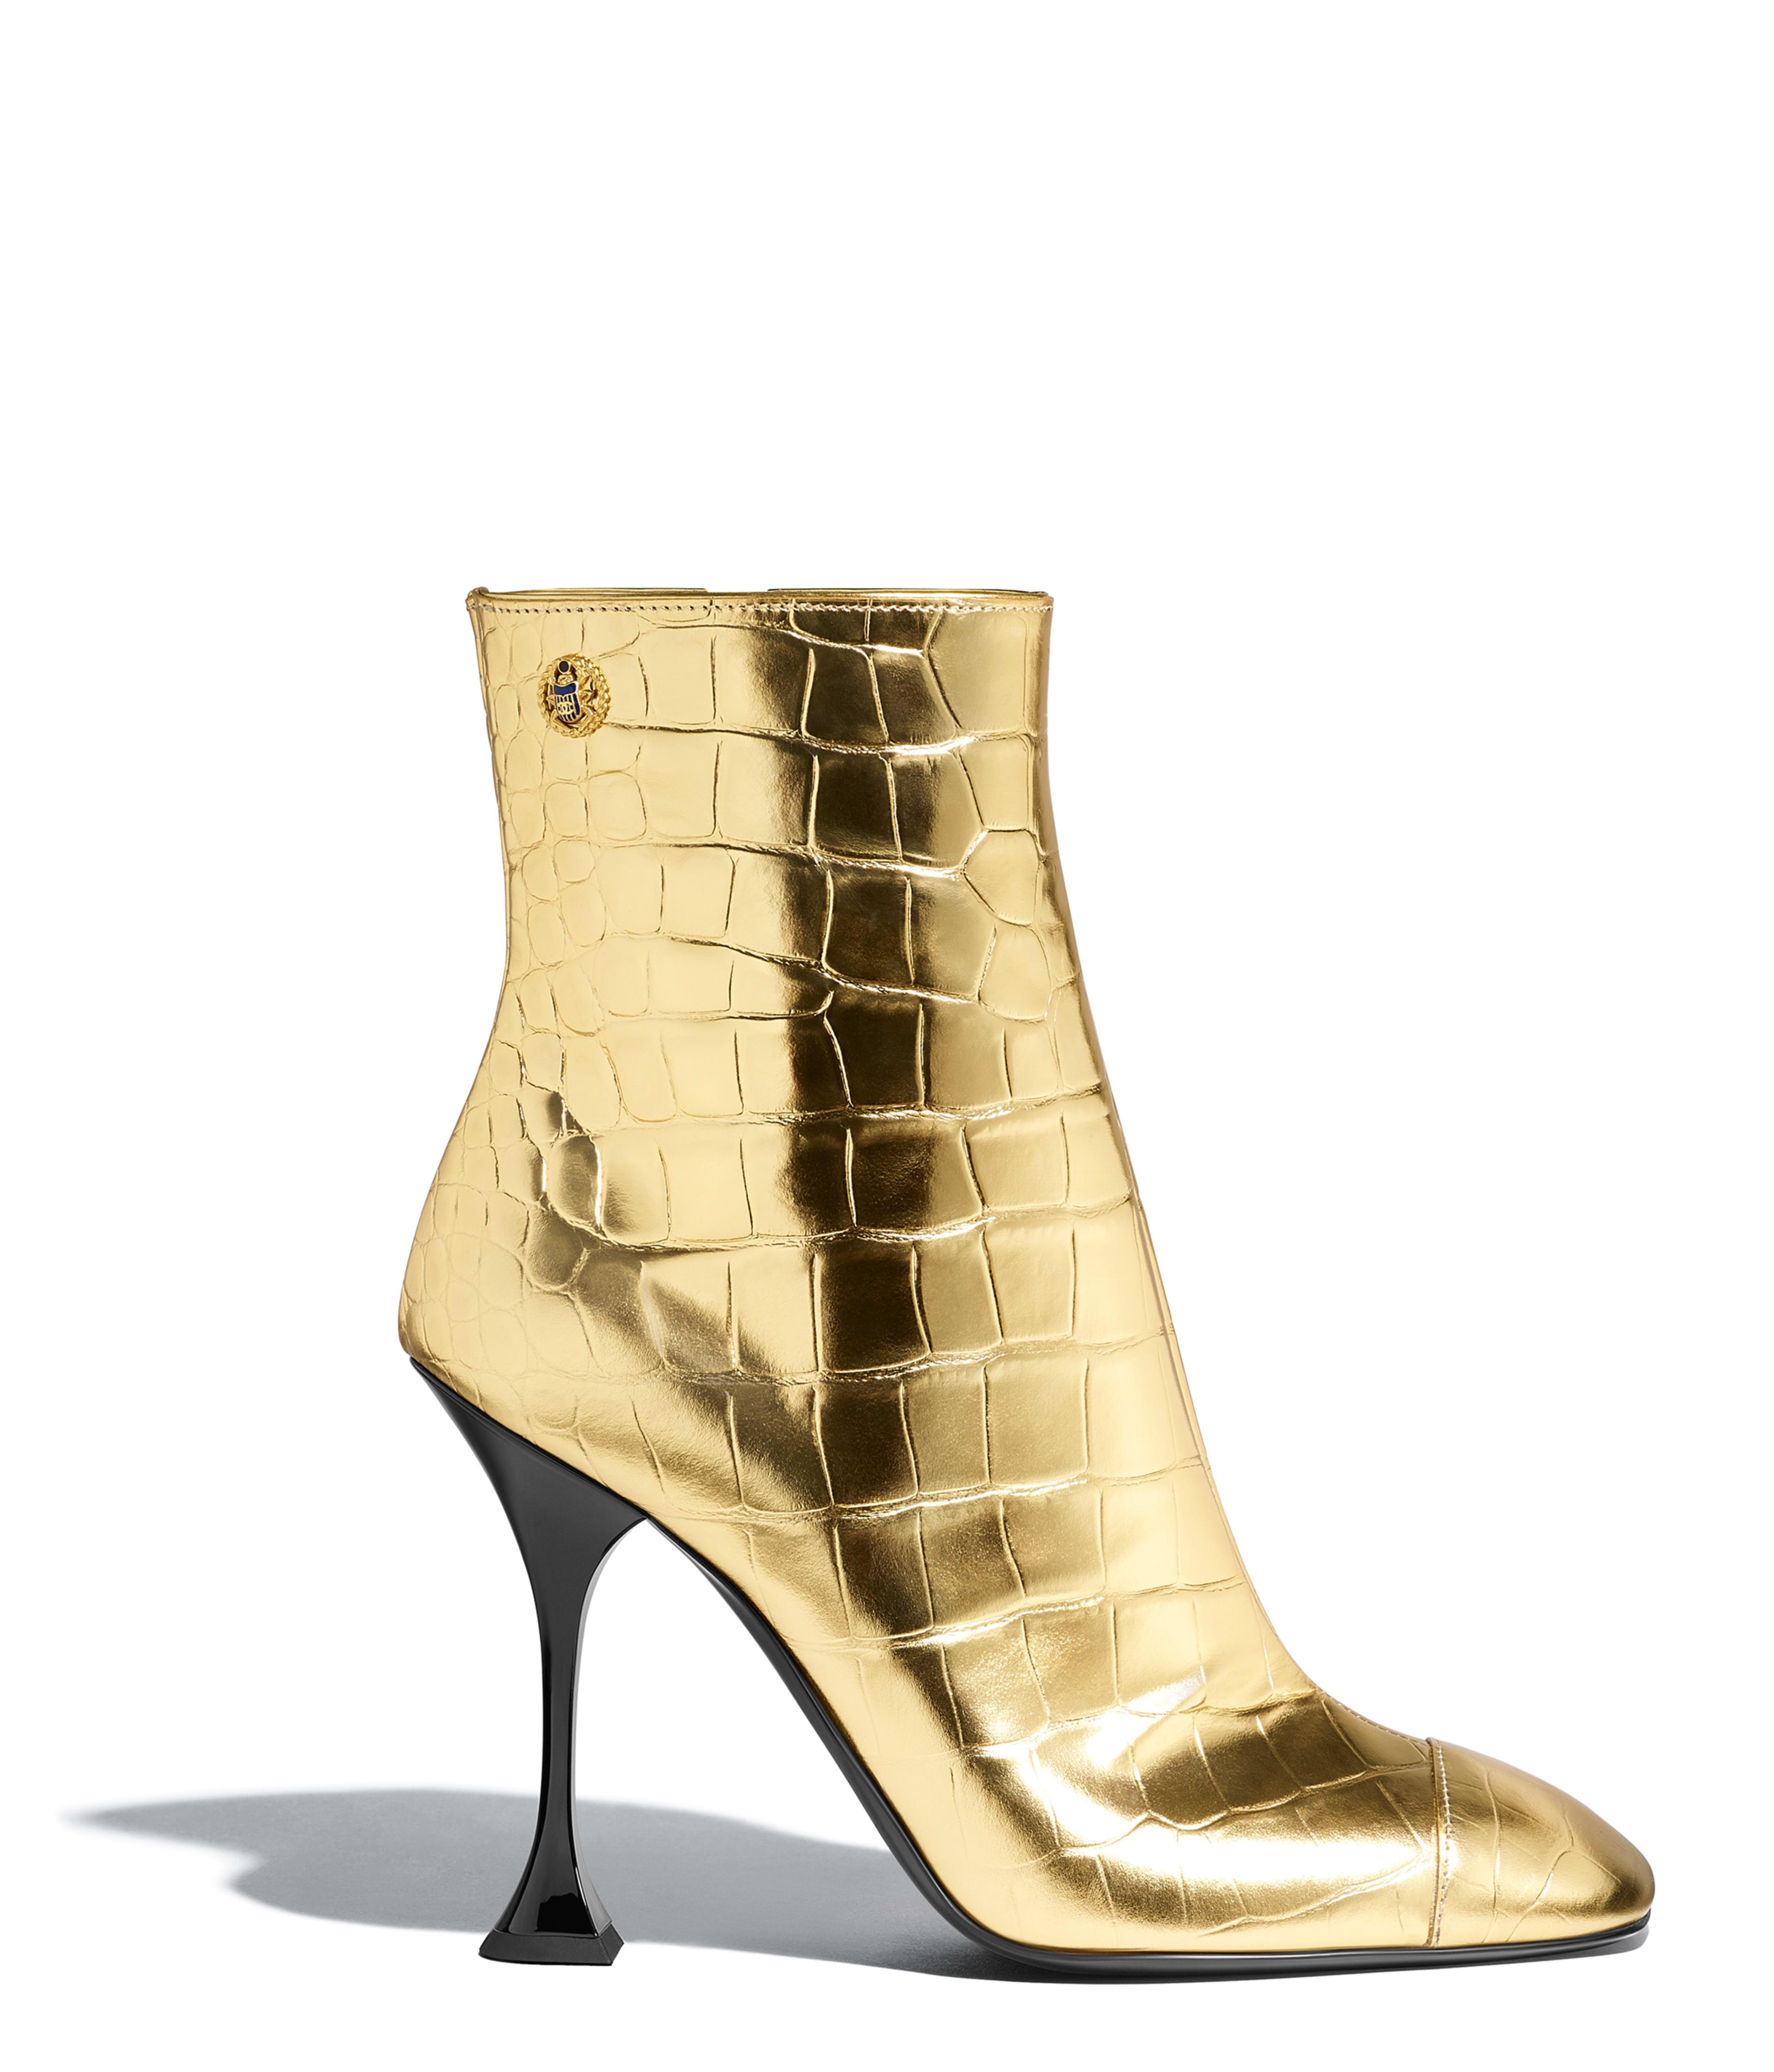 37b5a54692b8e3 Short Boots Crocodile Embossed Metallic Calfskin, Gold Ref.  G34902X530300H813